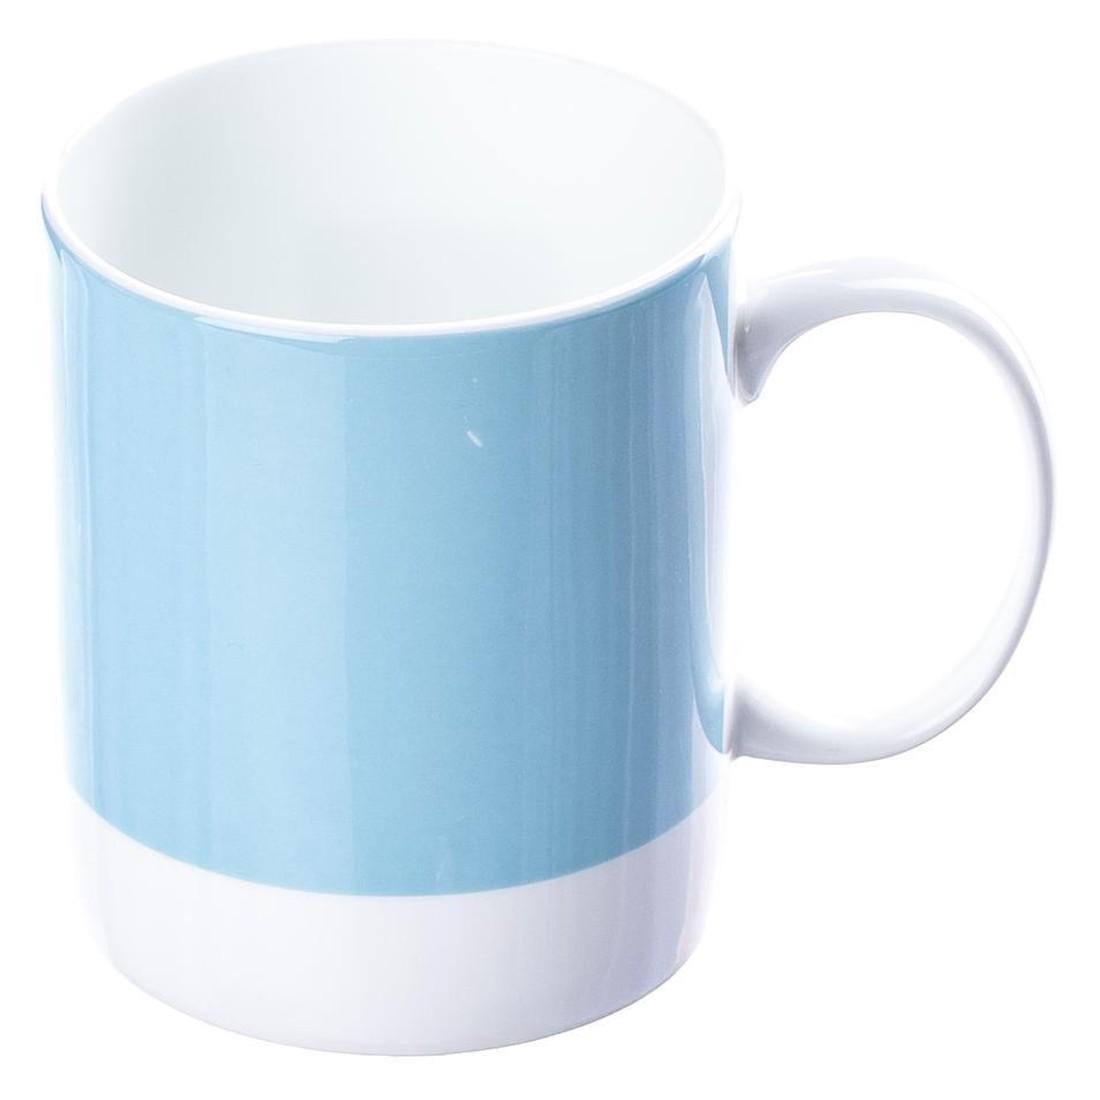 Kaffeebecher Vintage Blue – Porzellan – Blau, Pantone bestellen